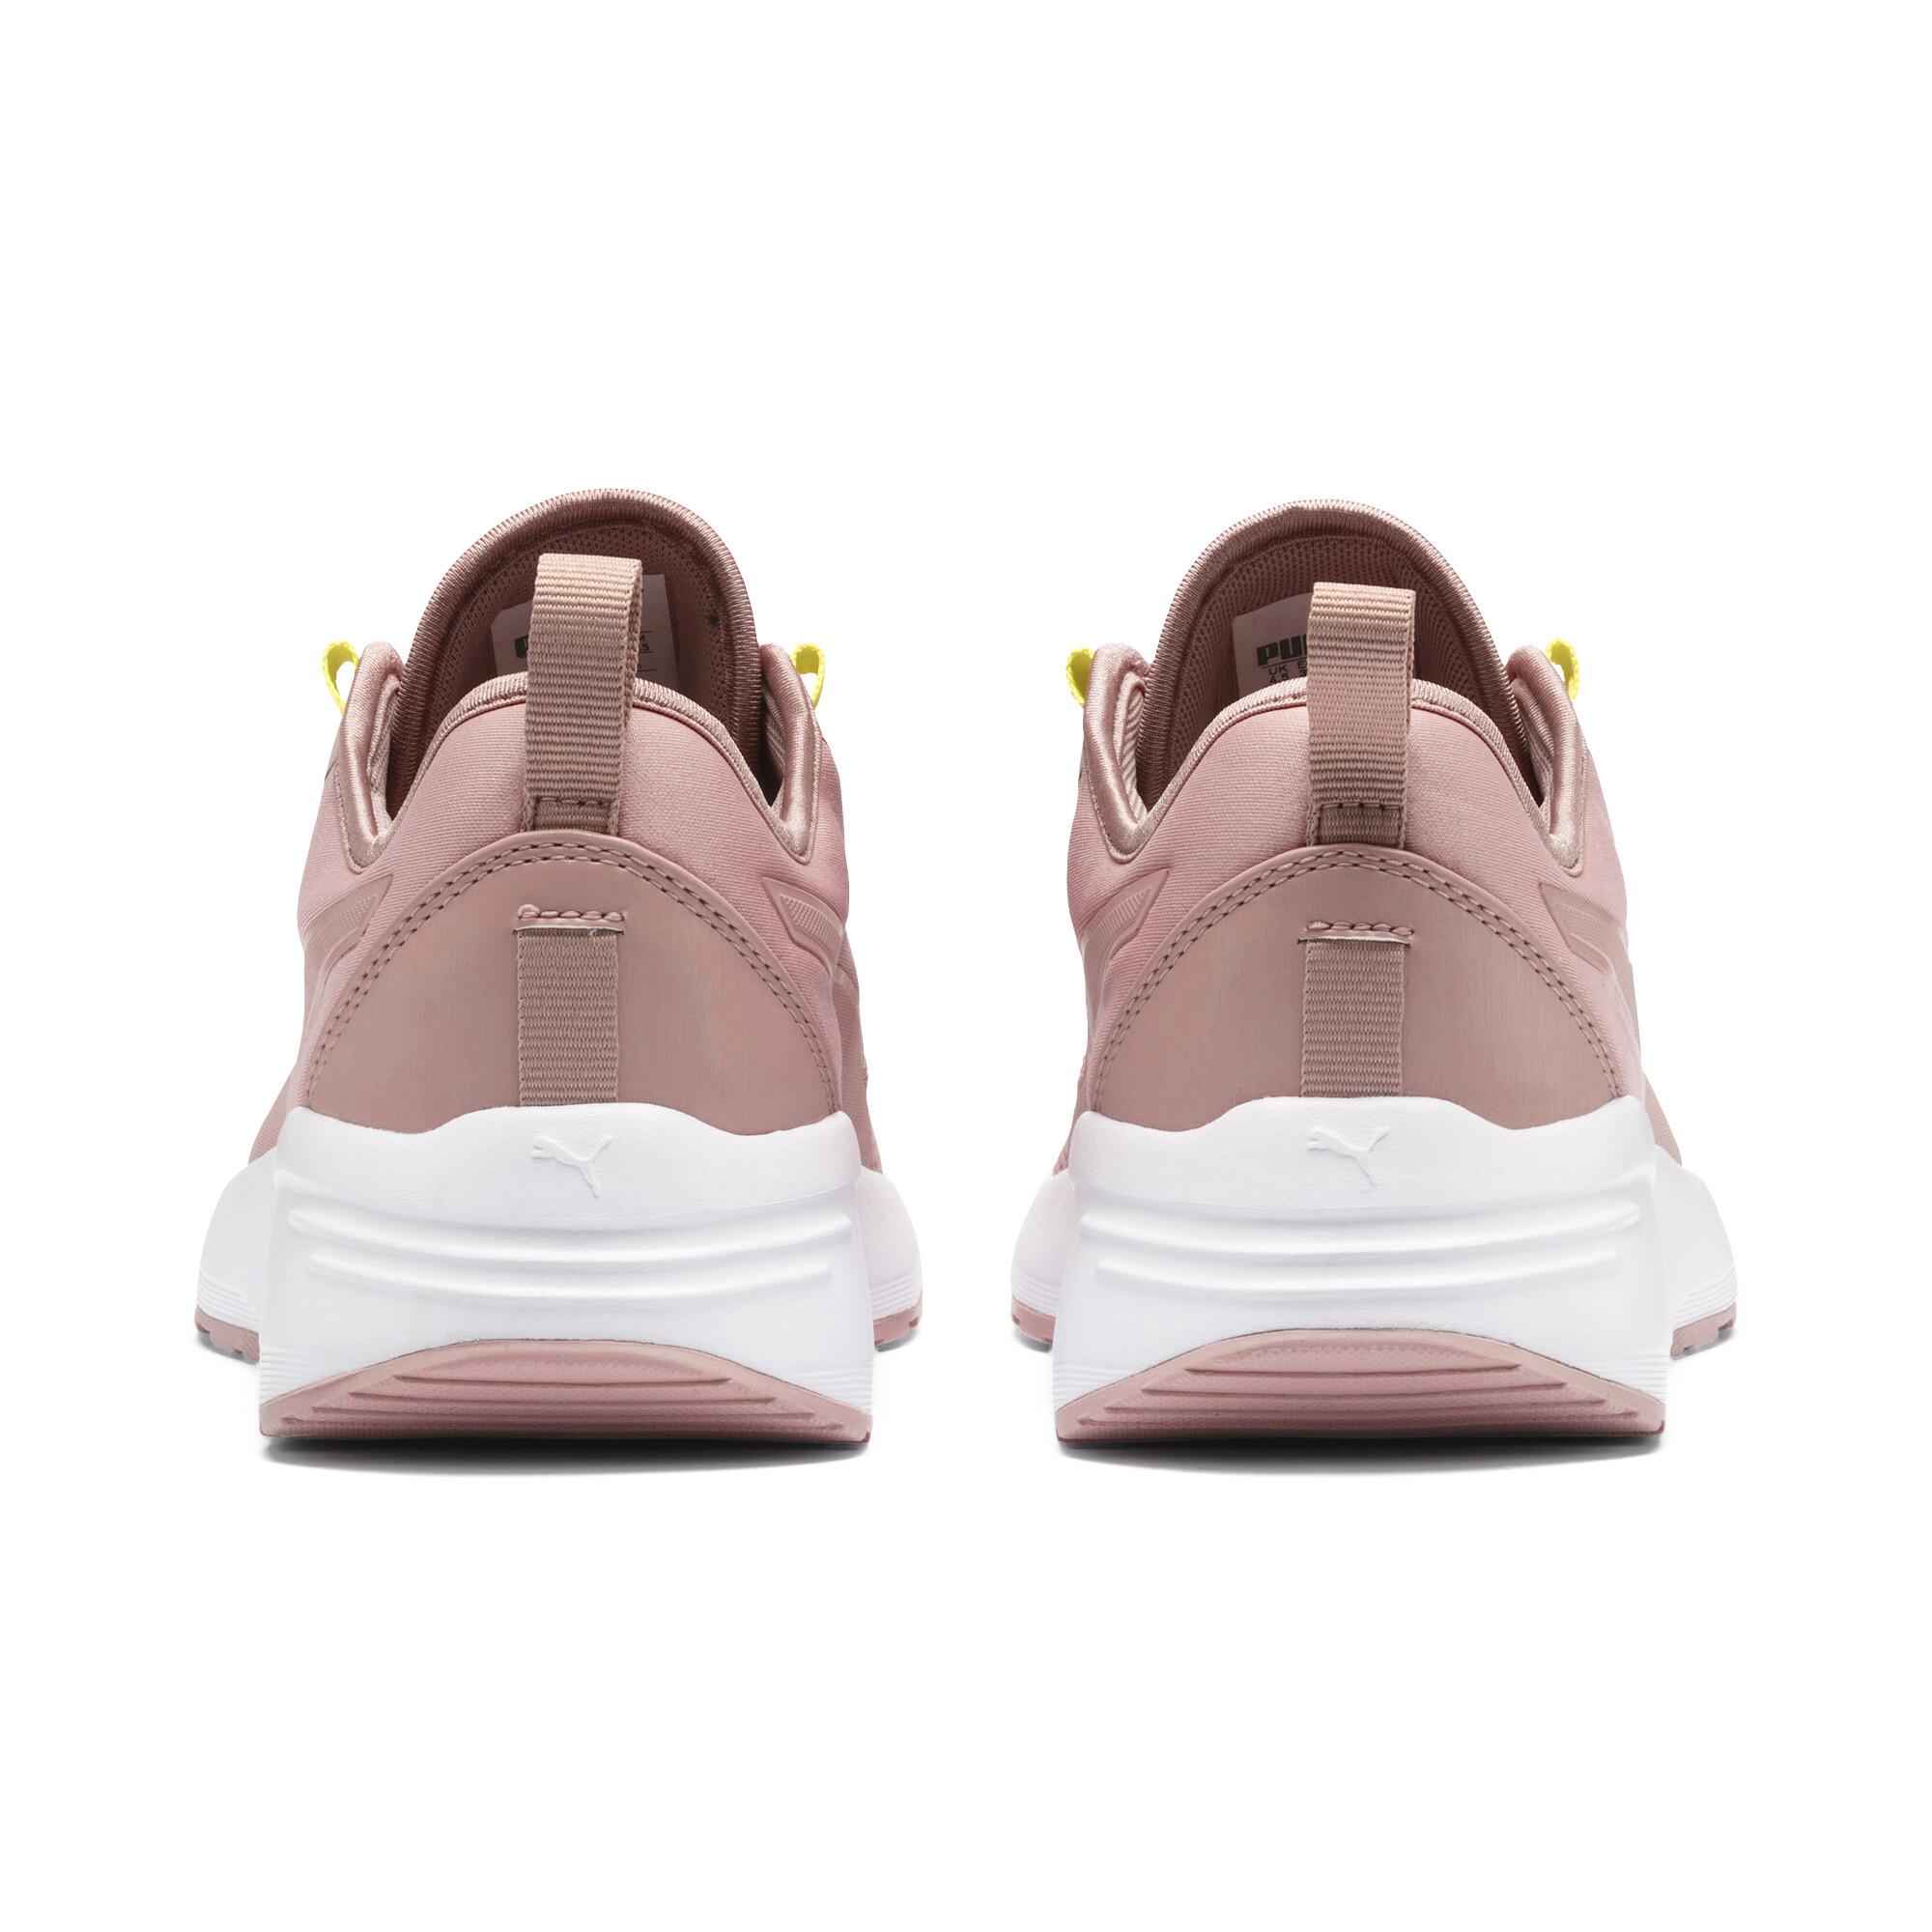 PUMA Sirena Sport Shift Damen Sneaker Frauen Schuhe Basics